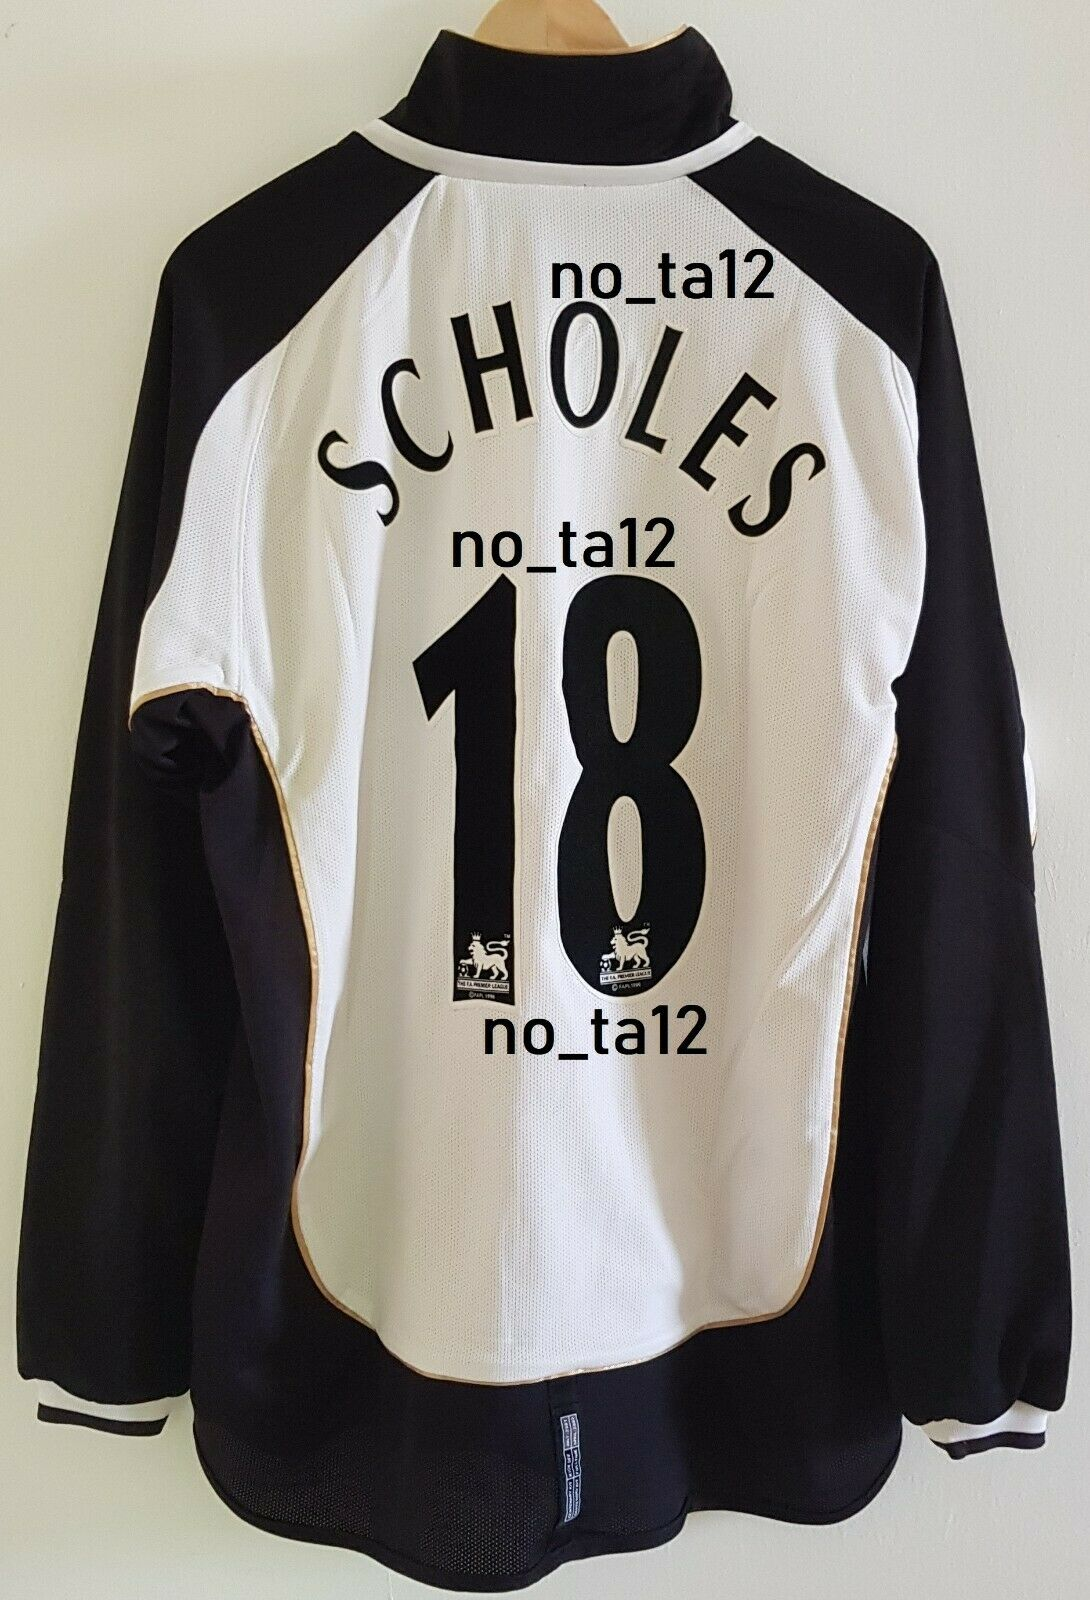 Manchester United Jersey Camisa 2001 2002 Raro Retro Centenario Scholes, hombre Unidos